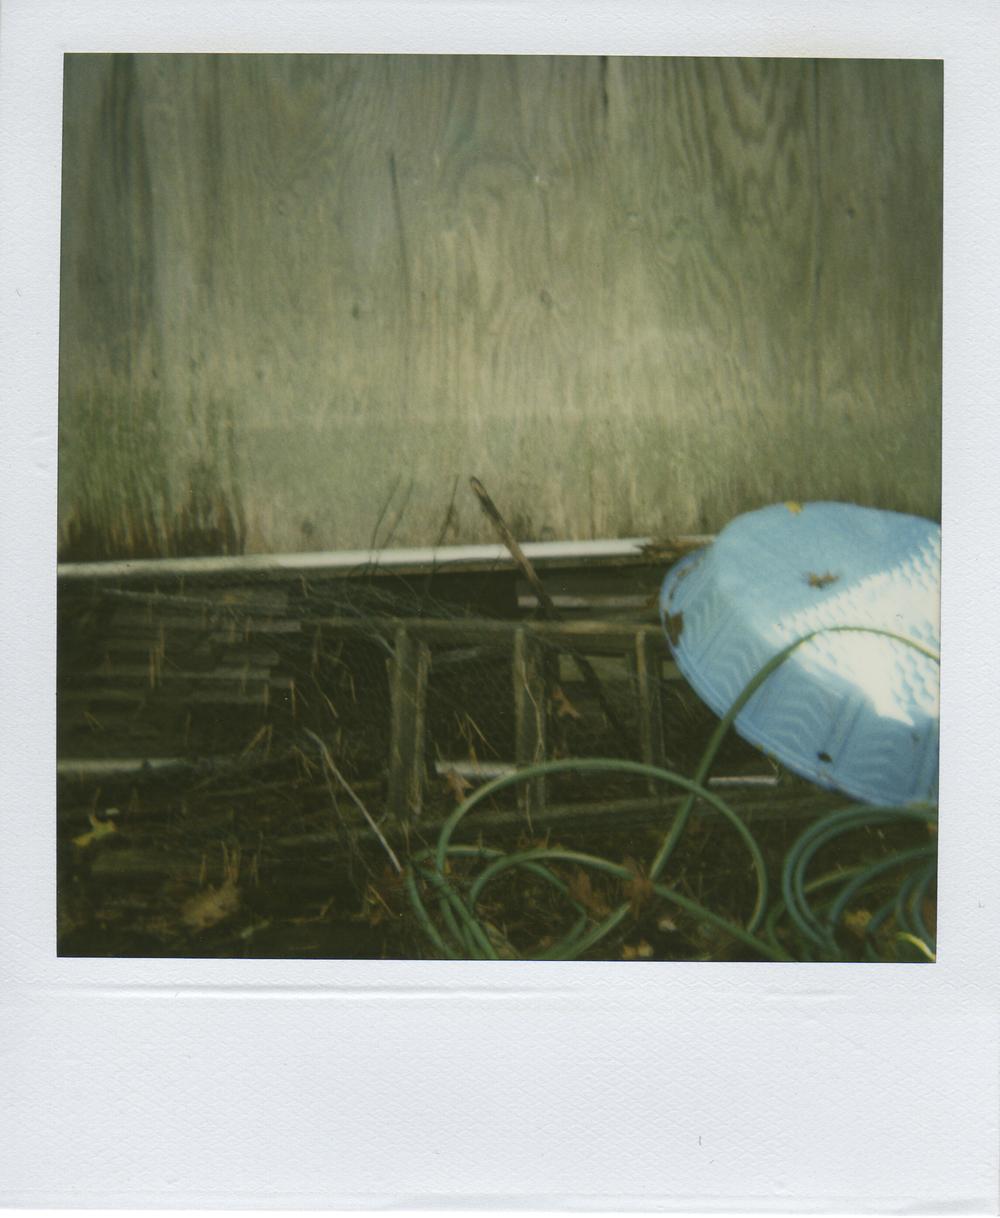 jlaurence-polaroid-118.jpg